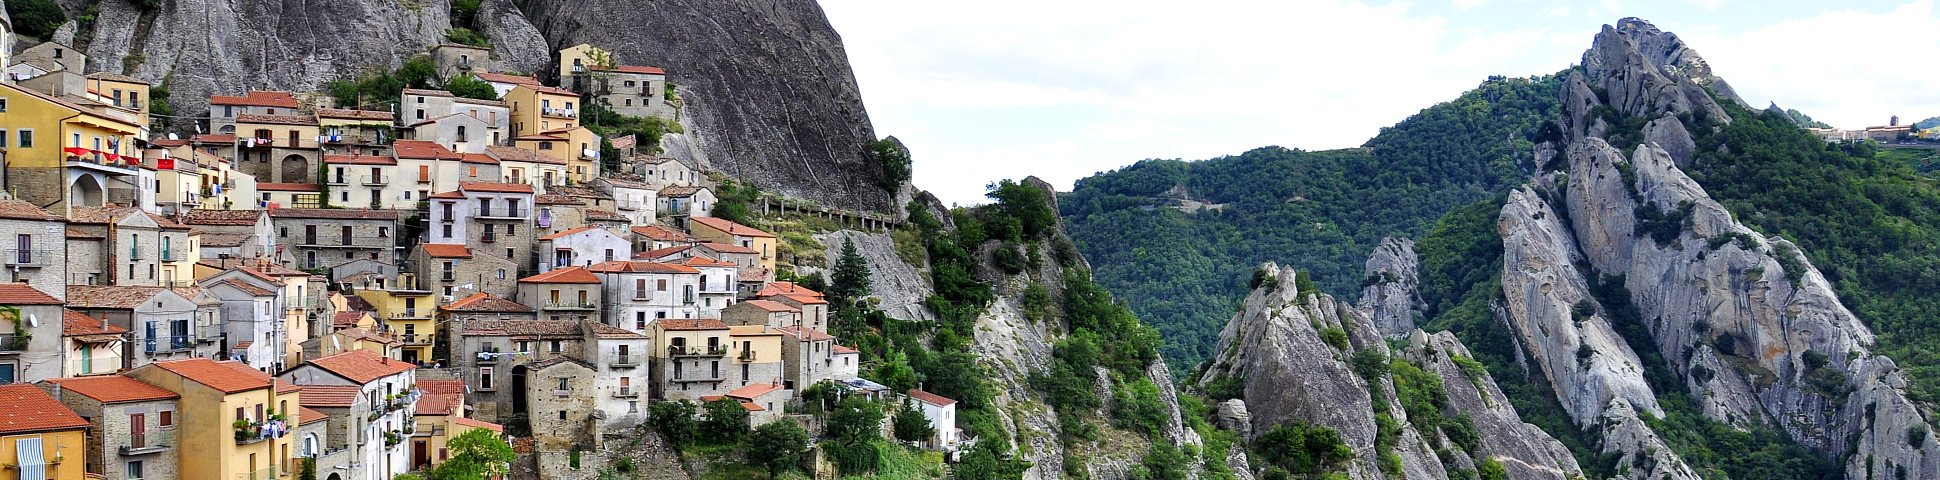 Town in Basilicata (Italy)